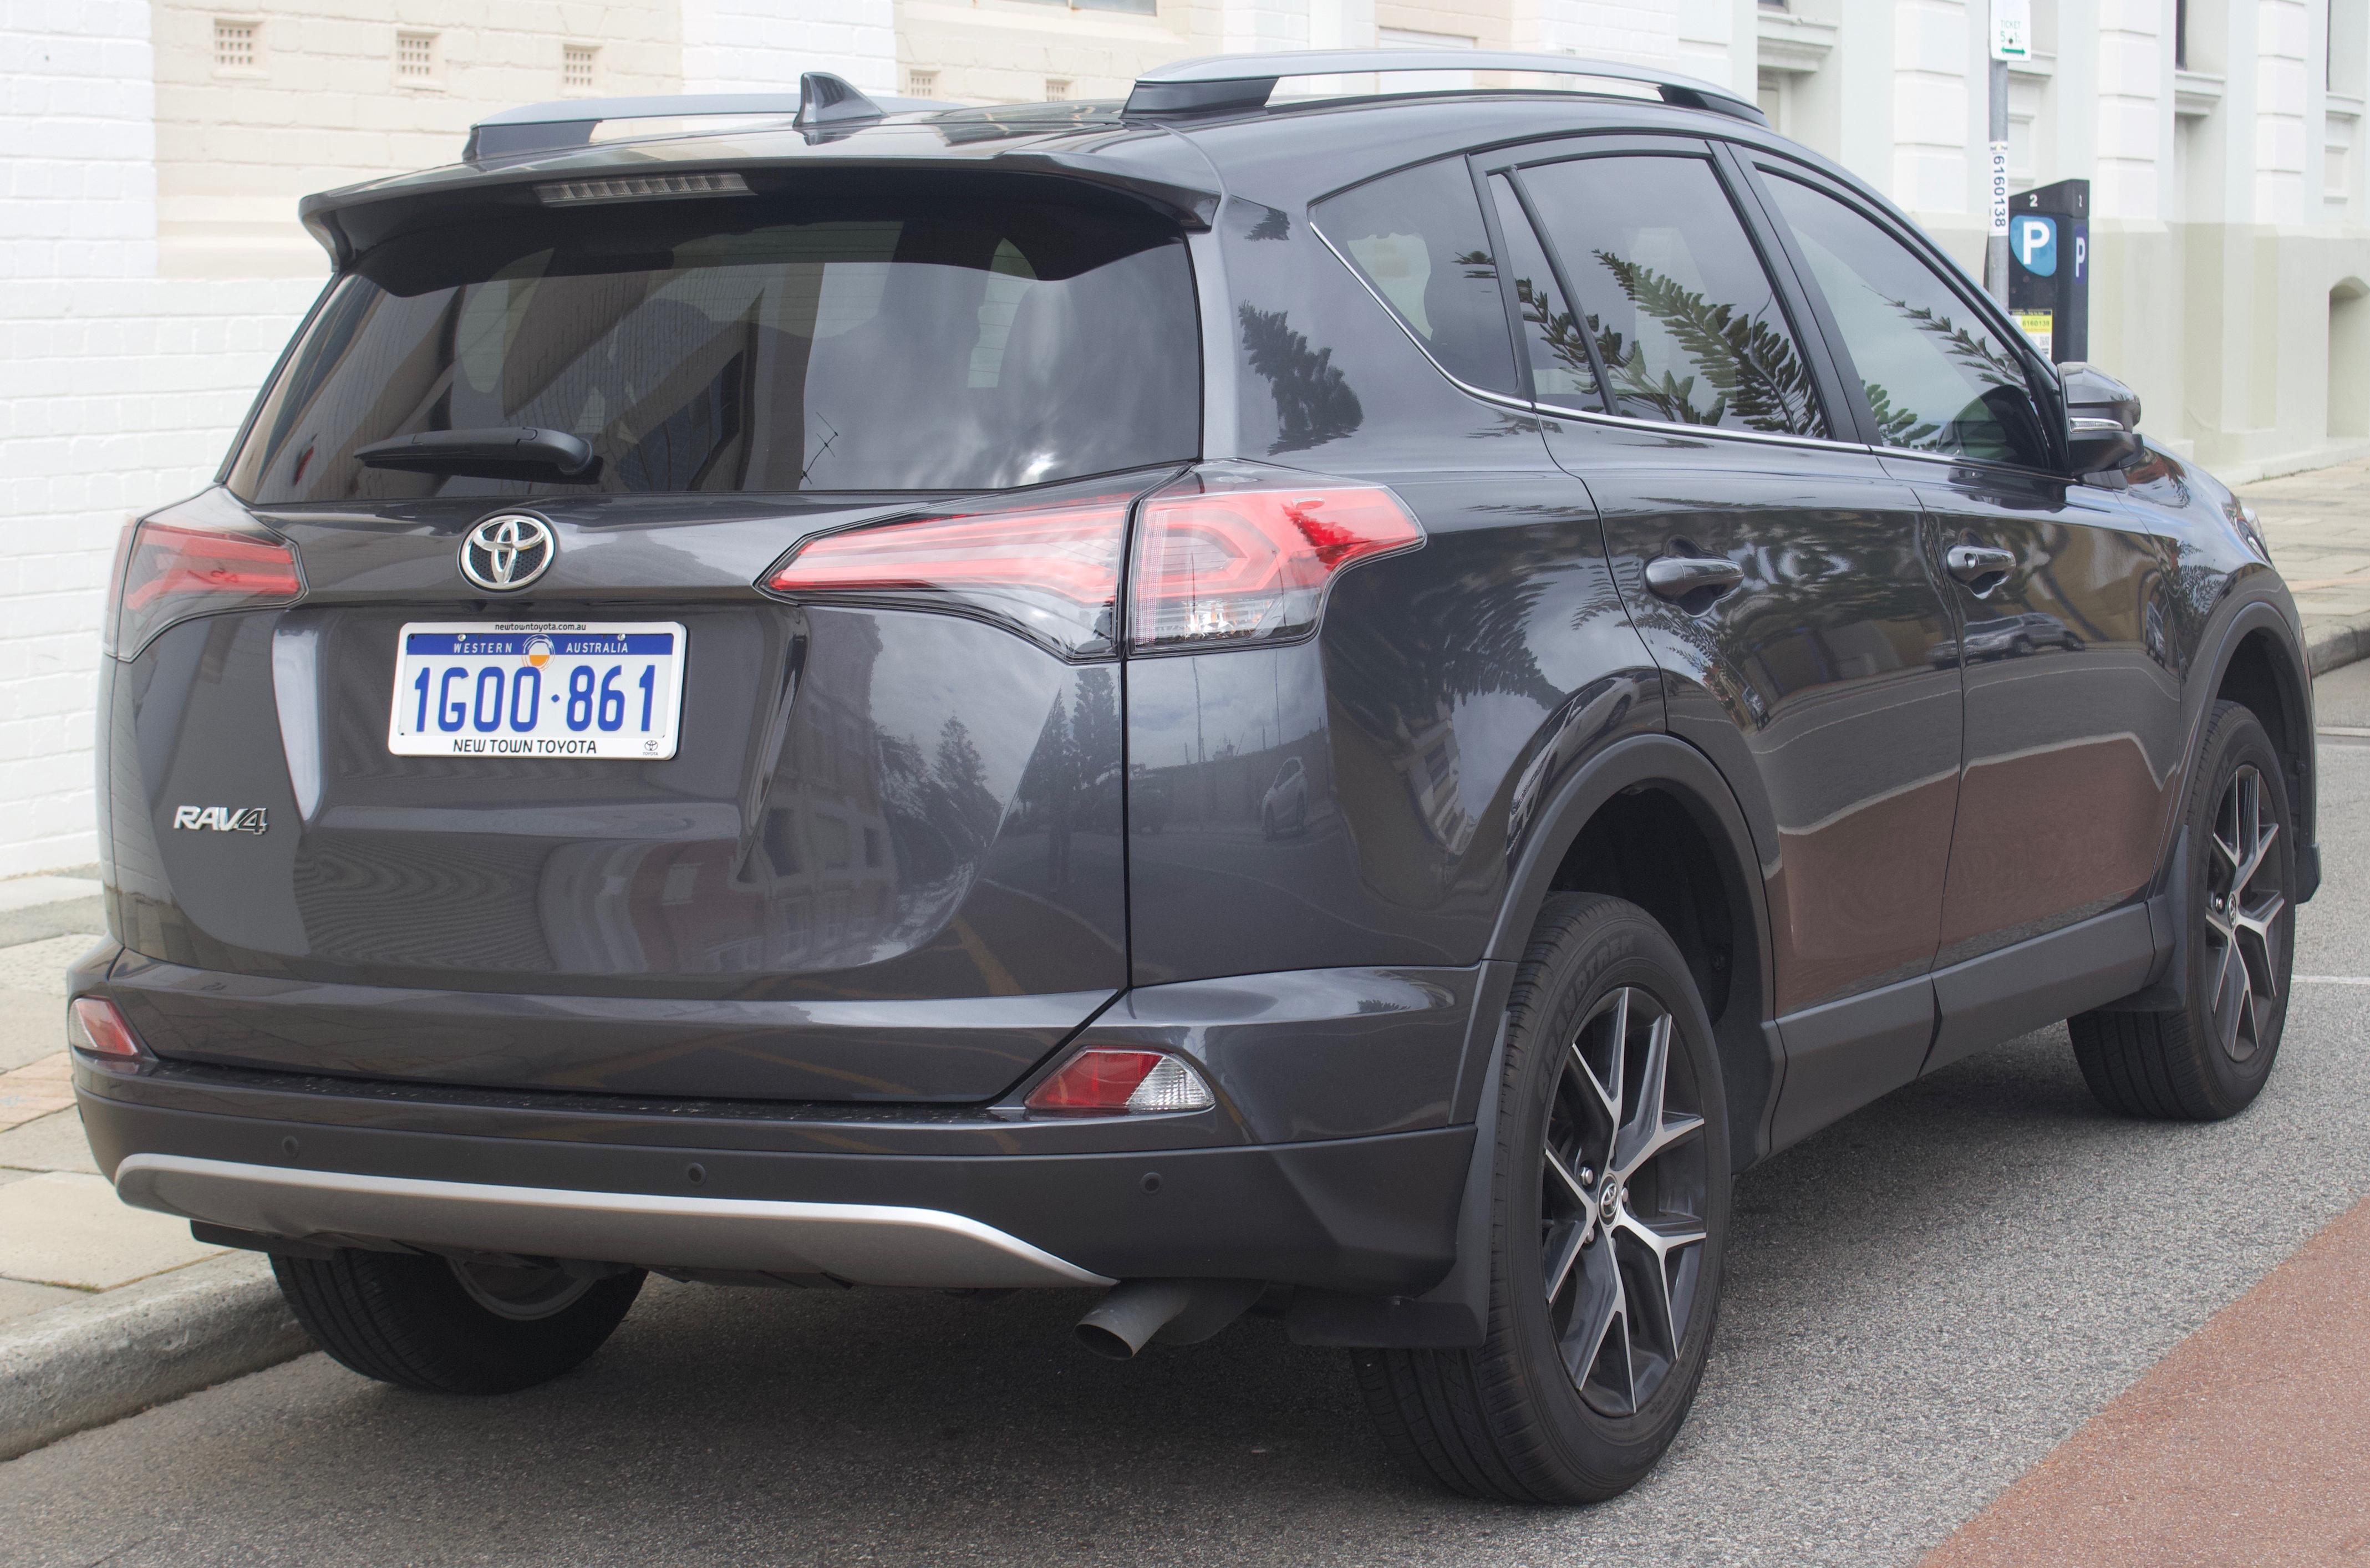 File 2018 Toyota Rav4 Zsa42r Gxl 2wd Wagon 2018 09 17 03 Jpg